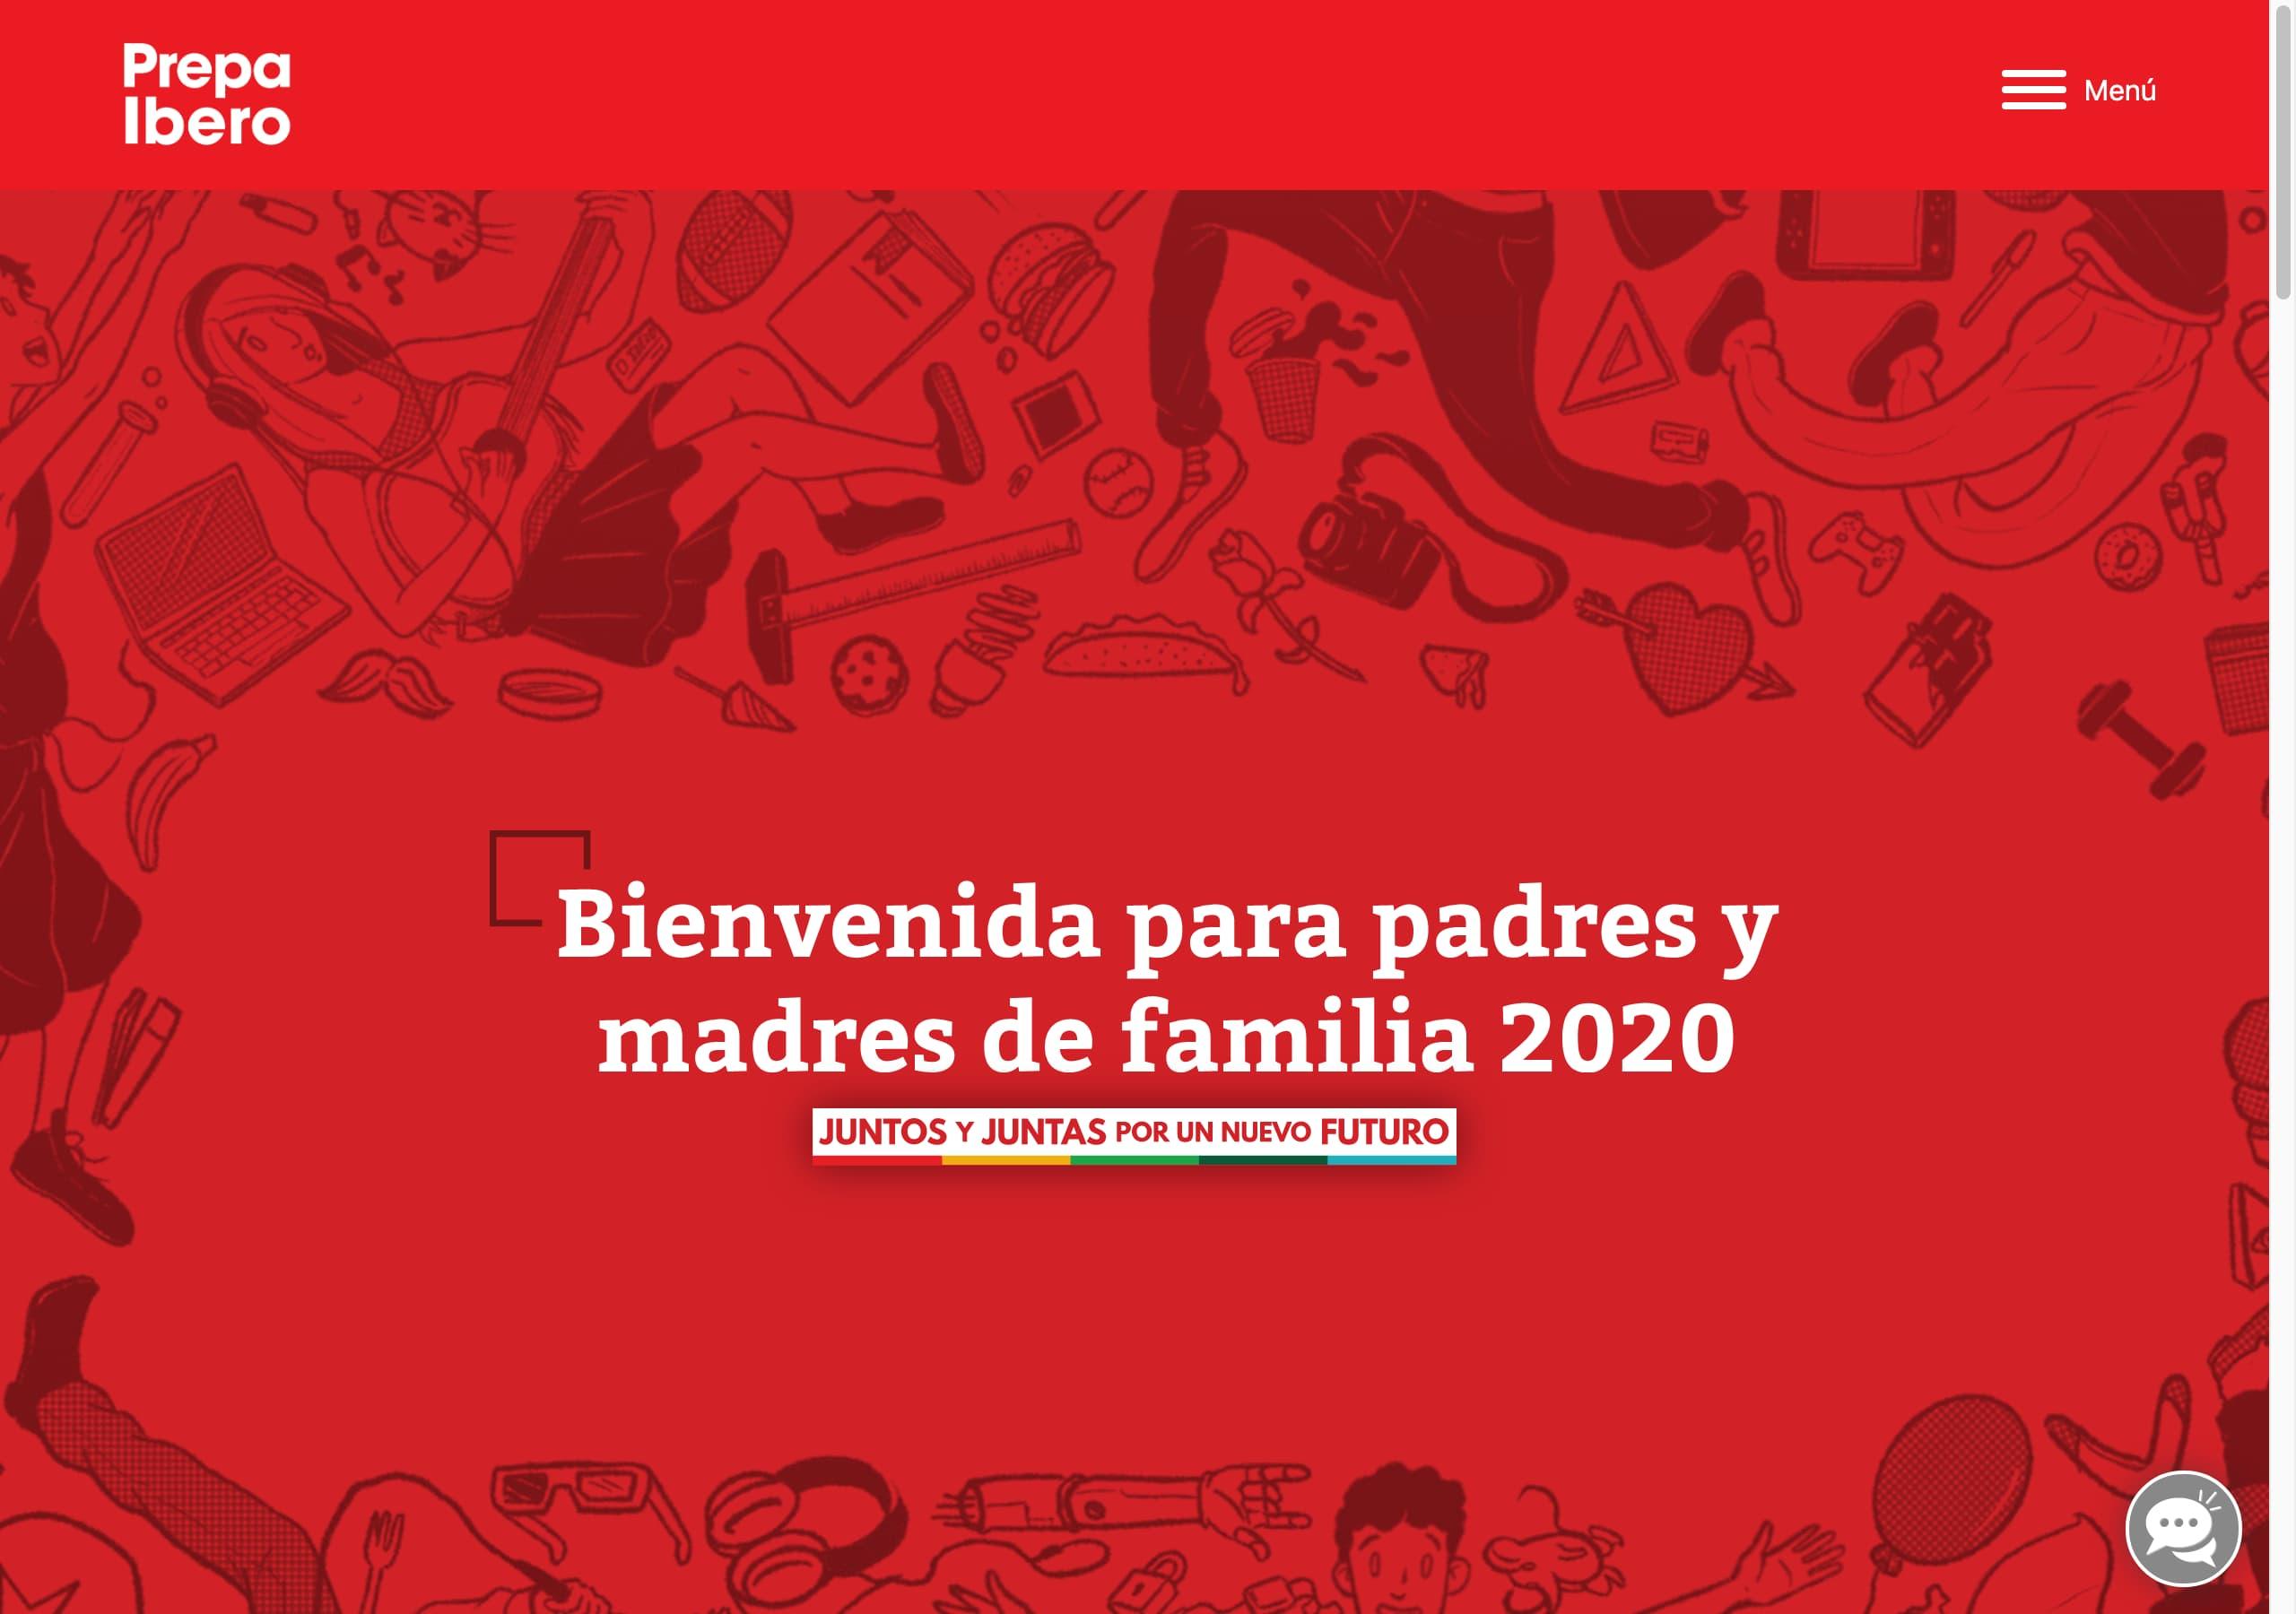 bienvenida.prepaibero.mx